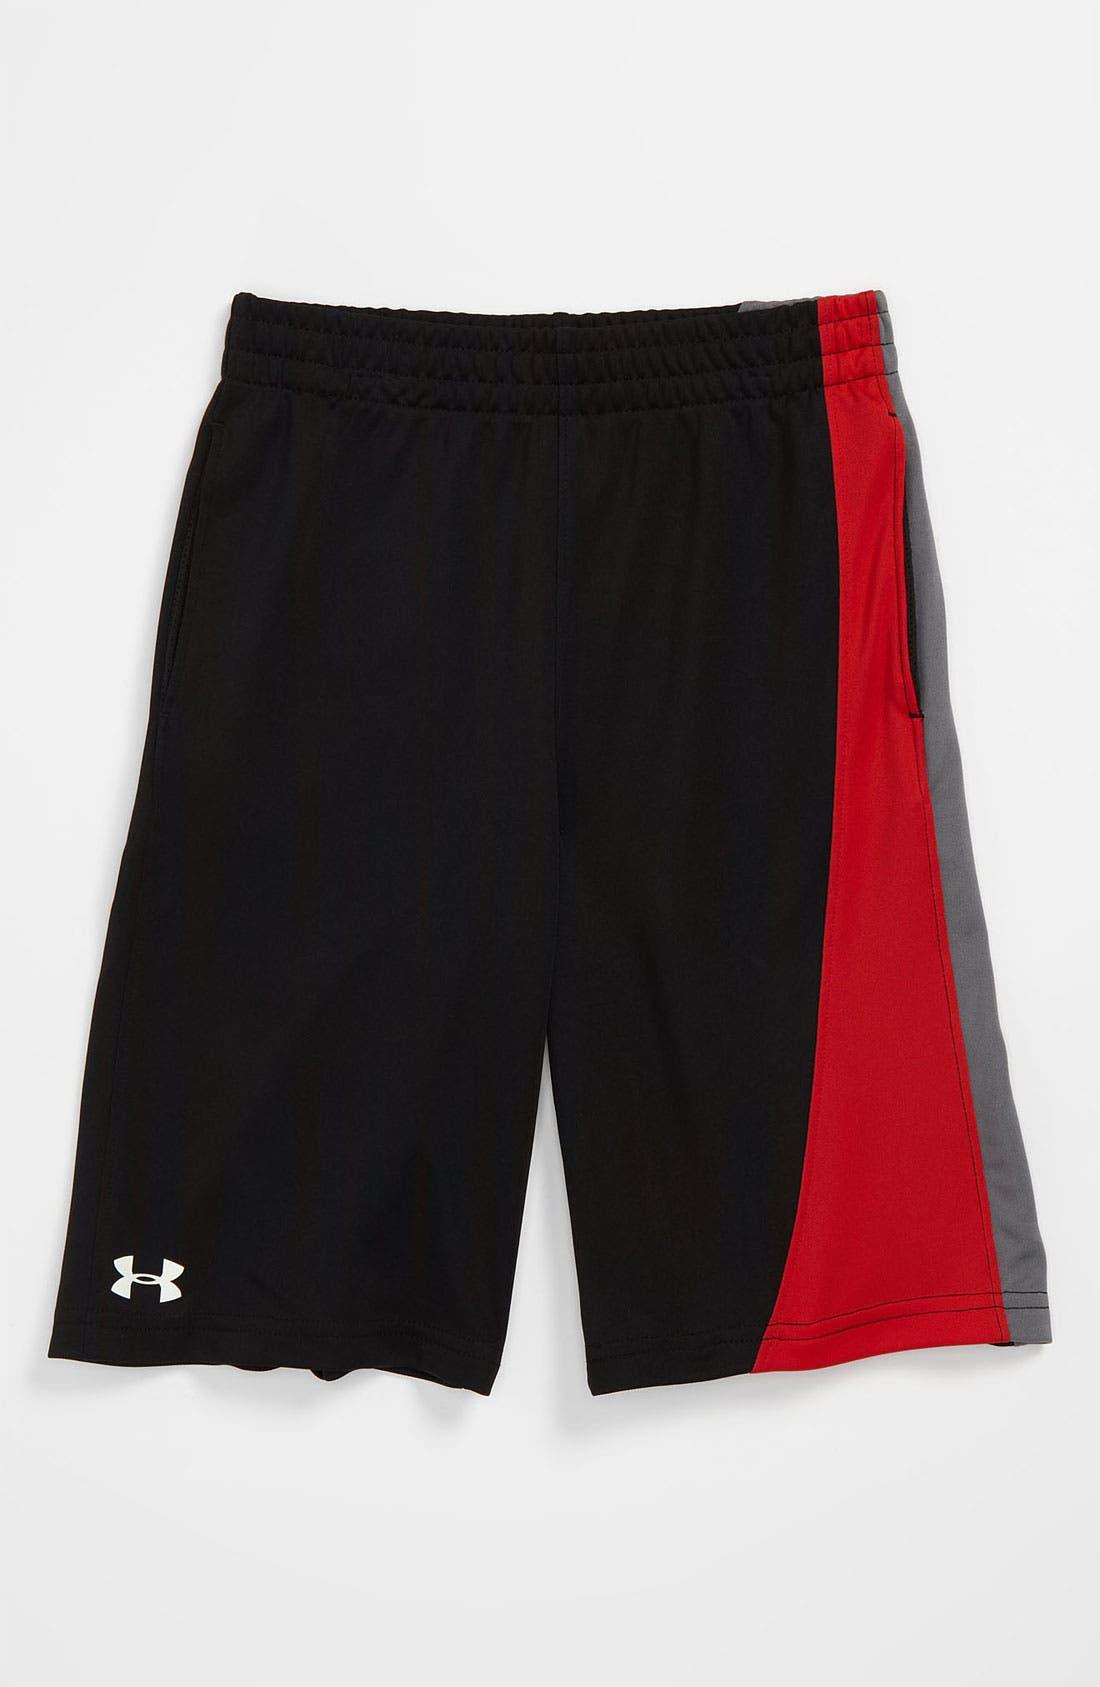 Alternate Image 1 Selected - Under Armour 'Flip'  HeatGear® Shorts (Little Boys)